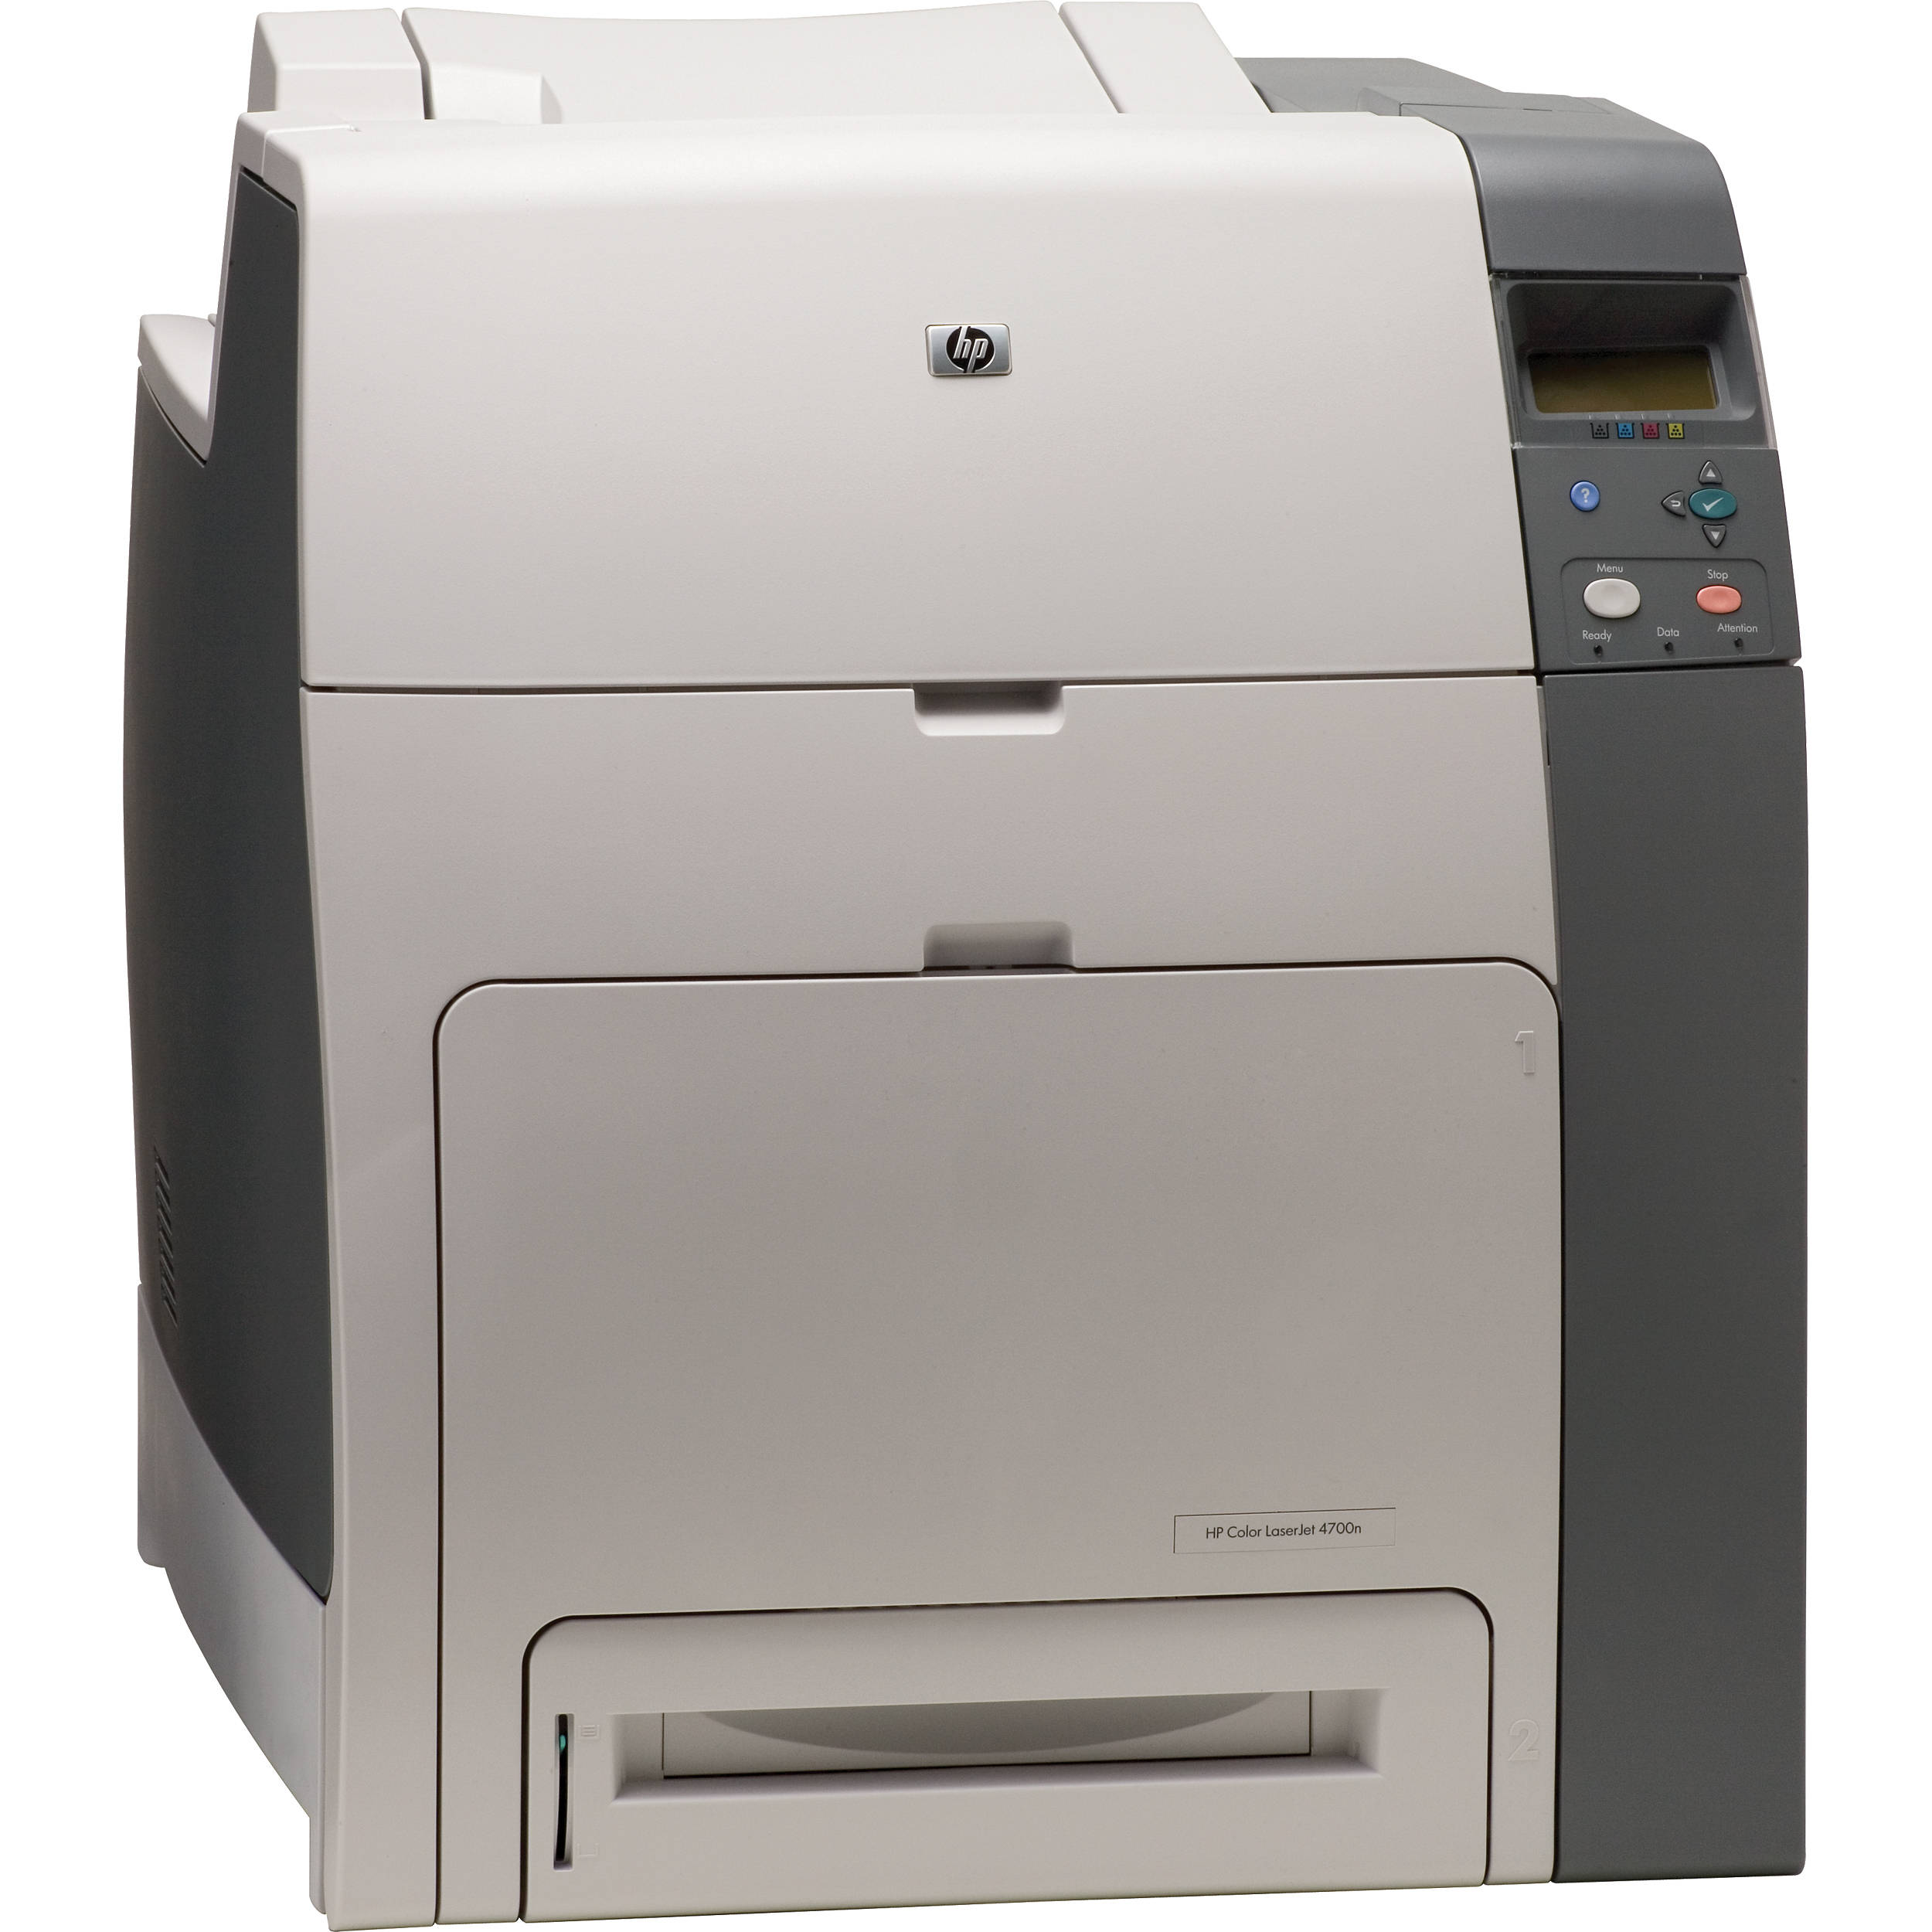 HP Color LaserJet 4700n Printer